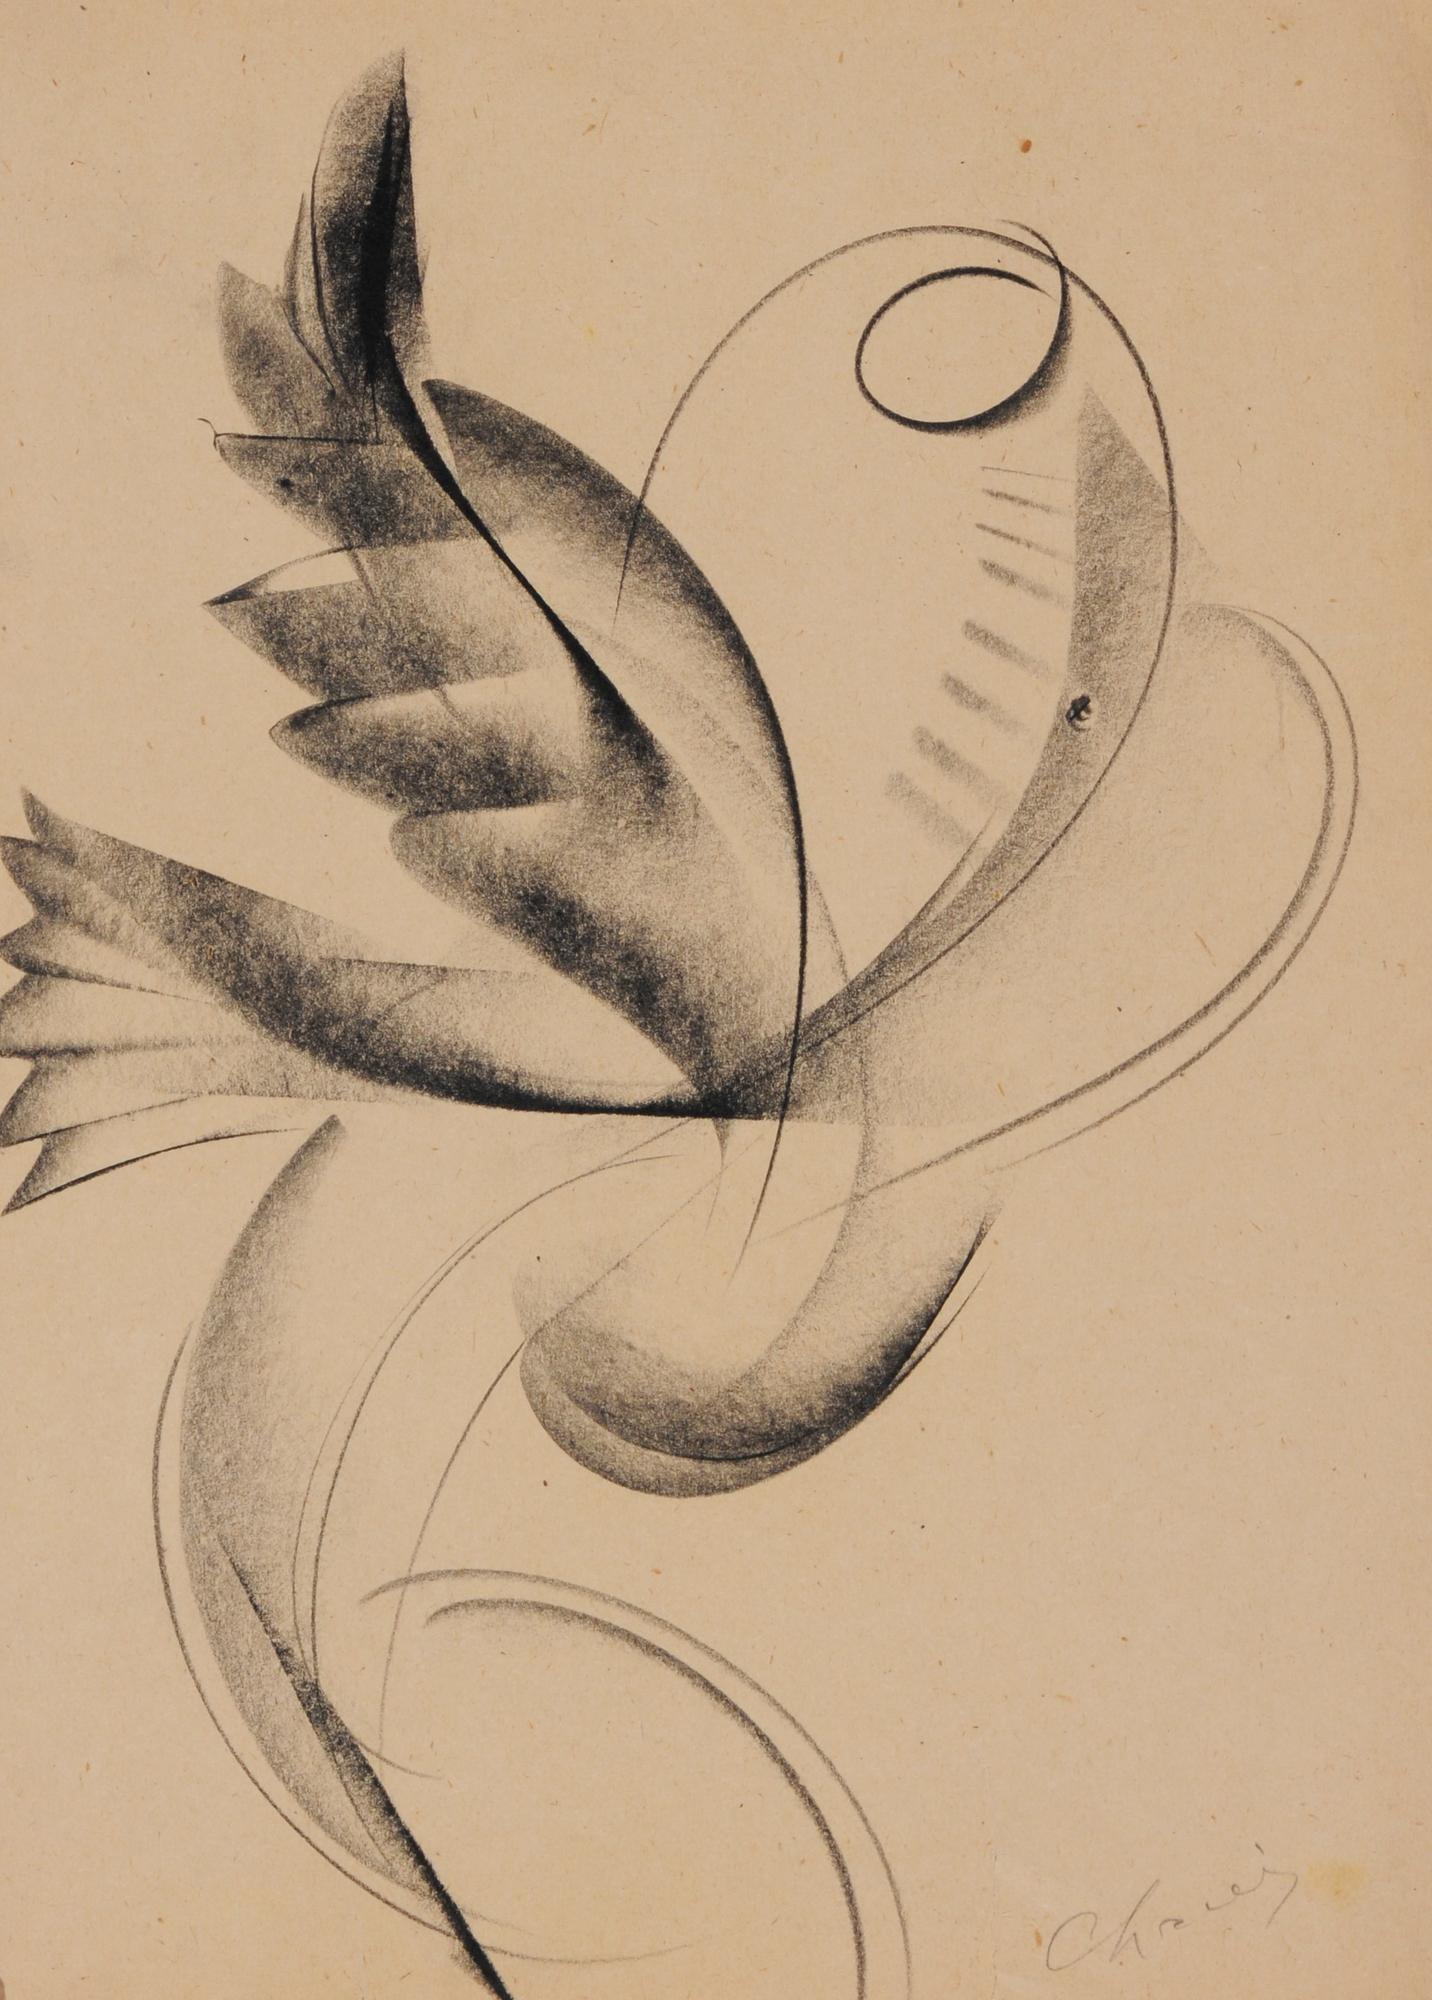 Chauvin Jean Gabriel, Composition